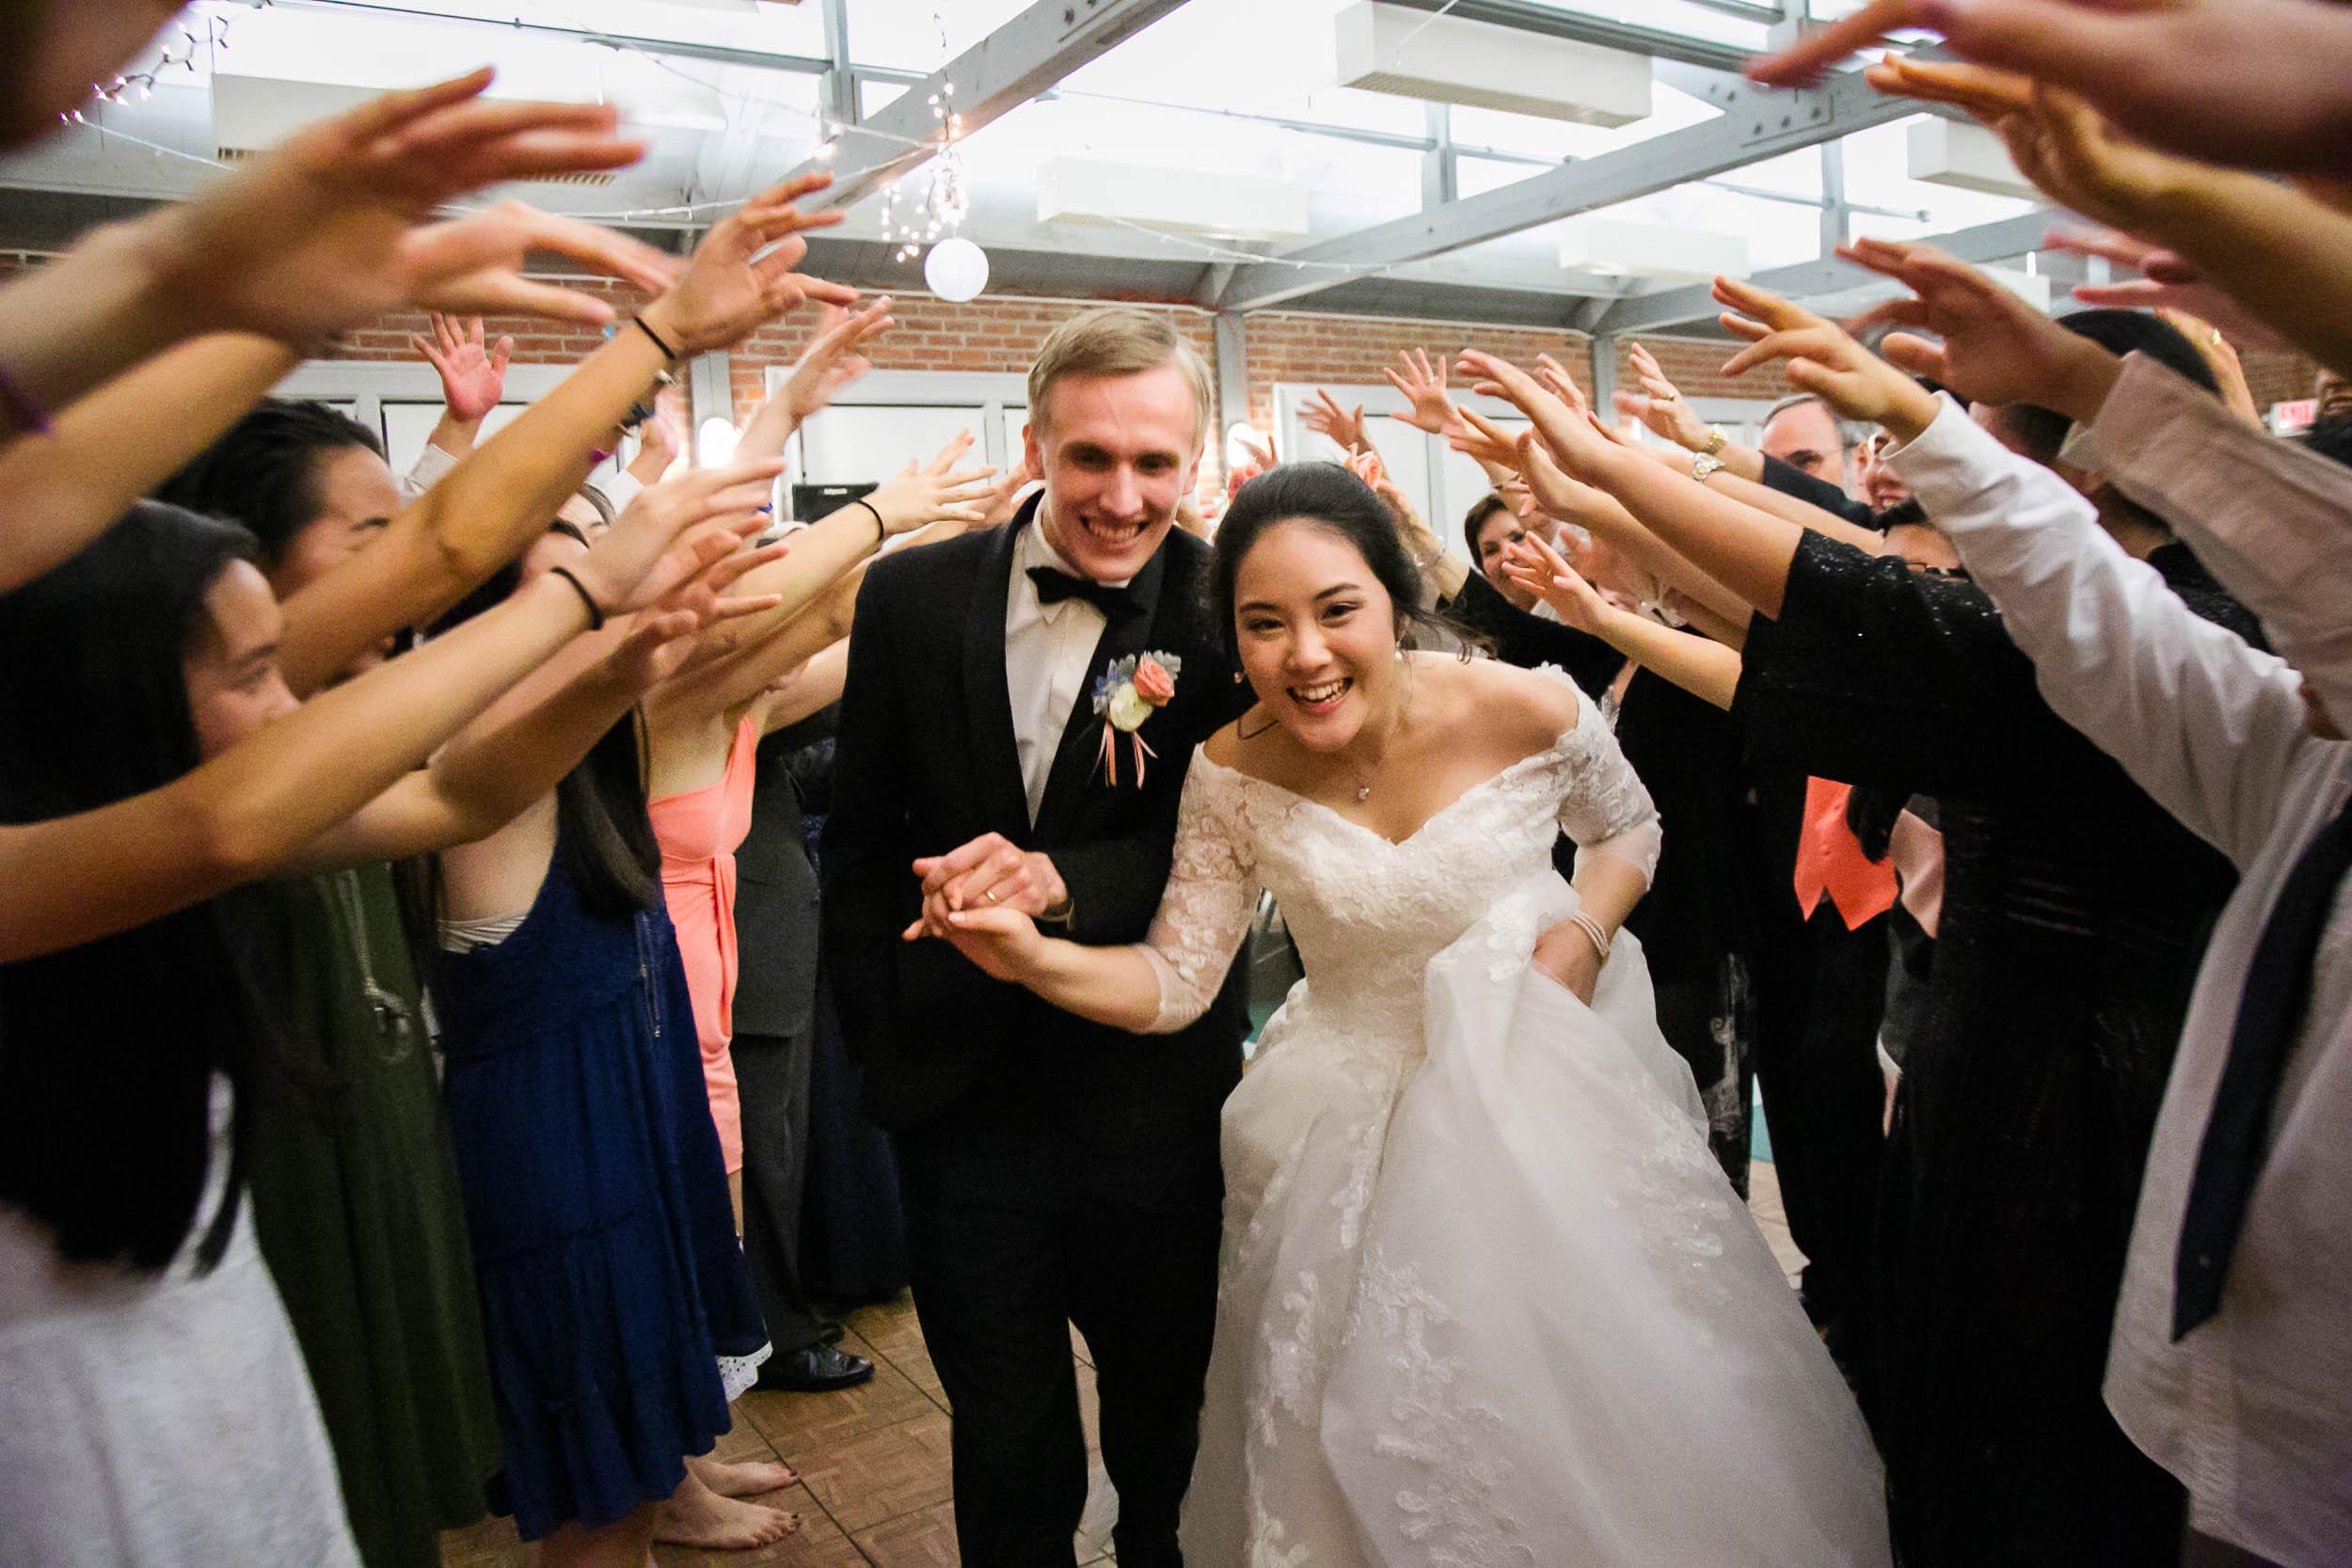 Raleigh Wedding Photographer   G. Lin Photography   Bride and groom exiting wedding